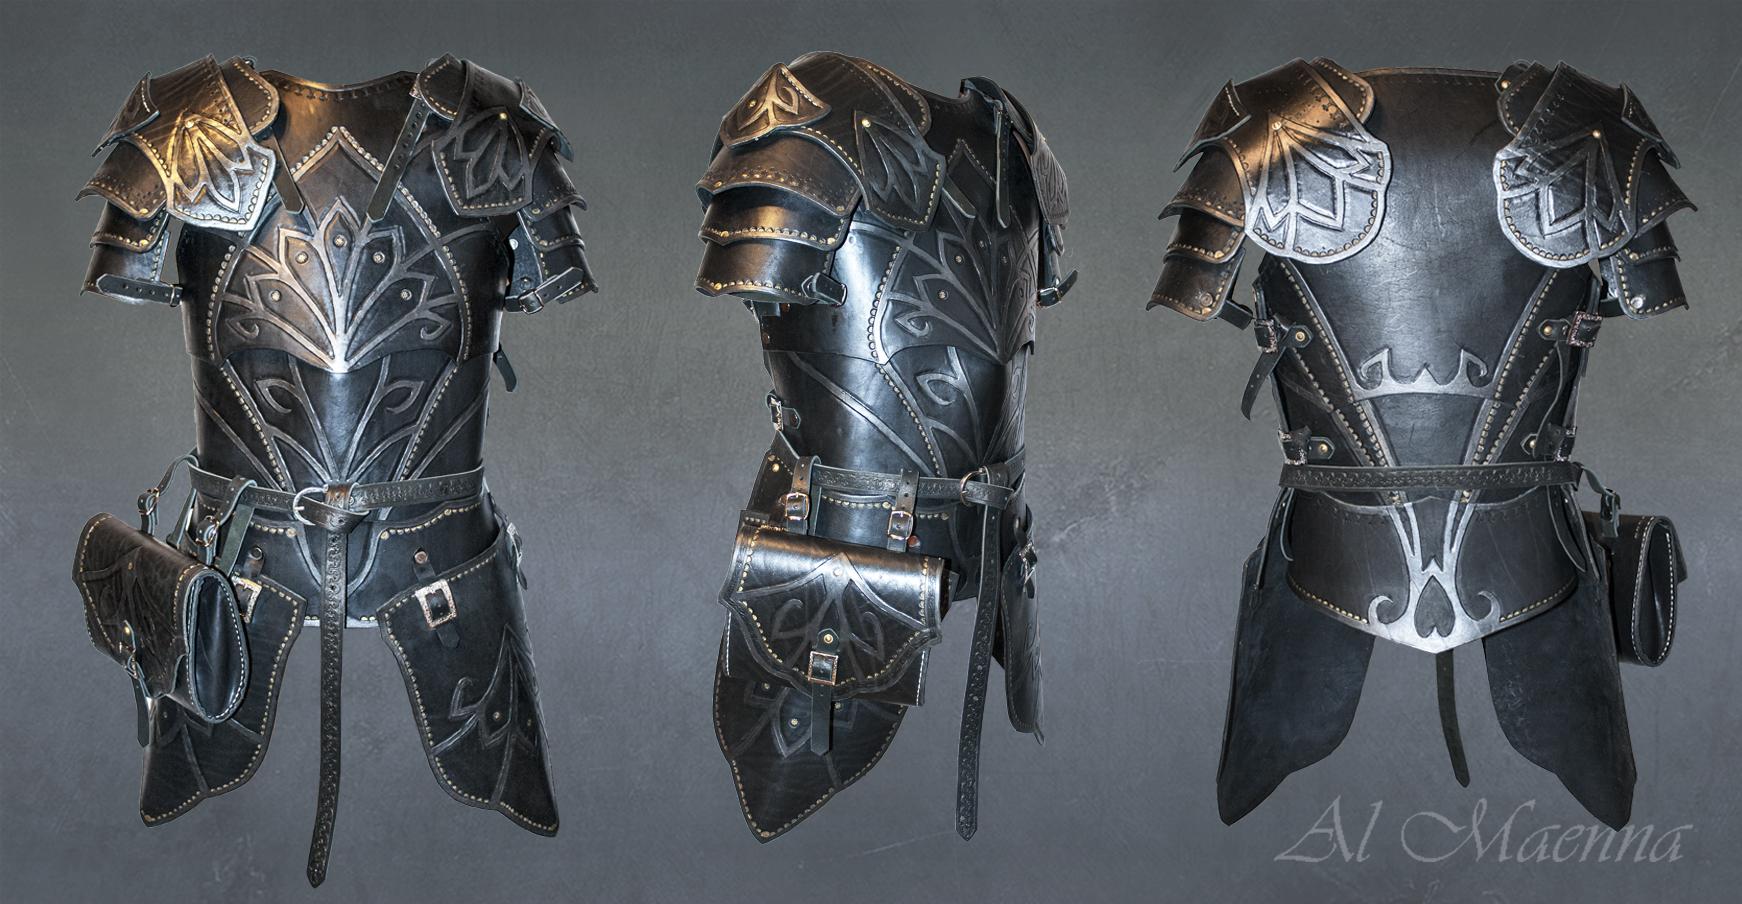 elven_armor_by_shattan-d6u8akz.jpg]]